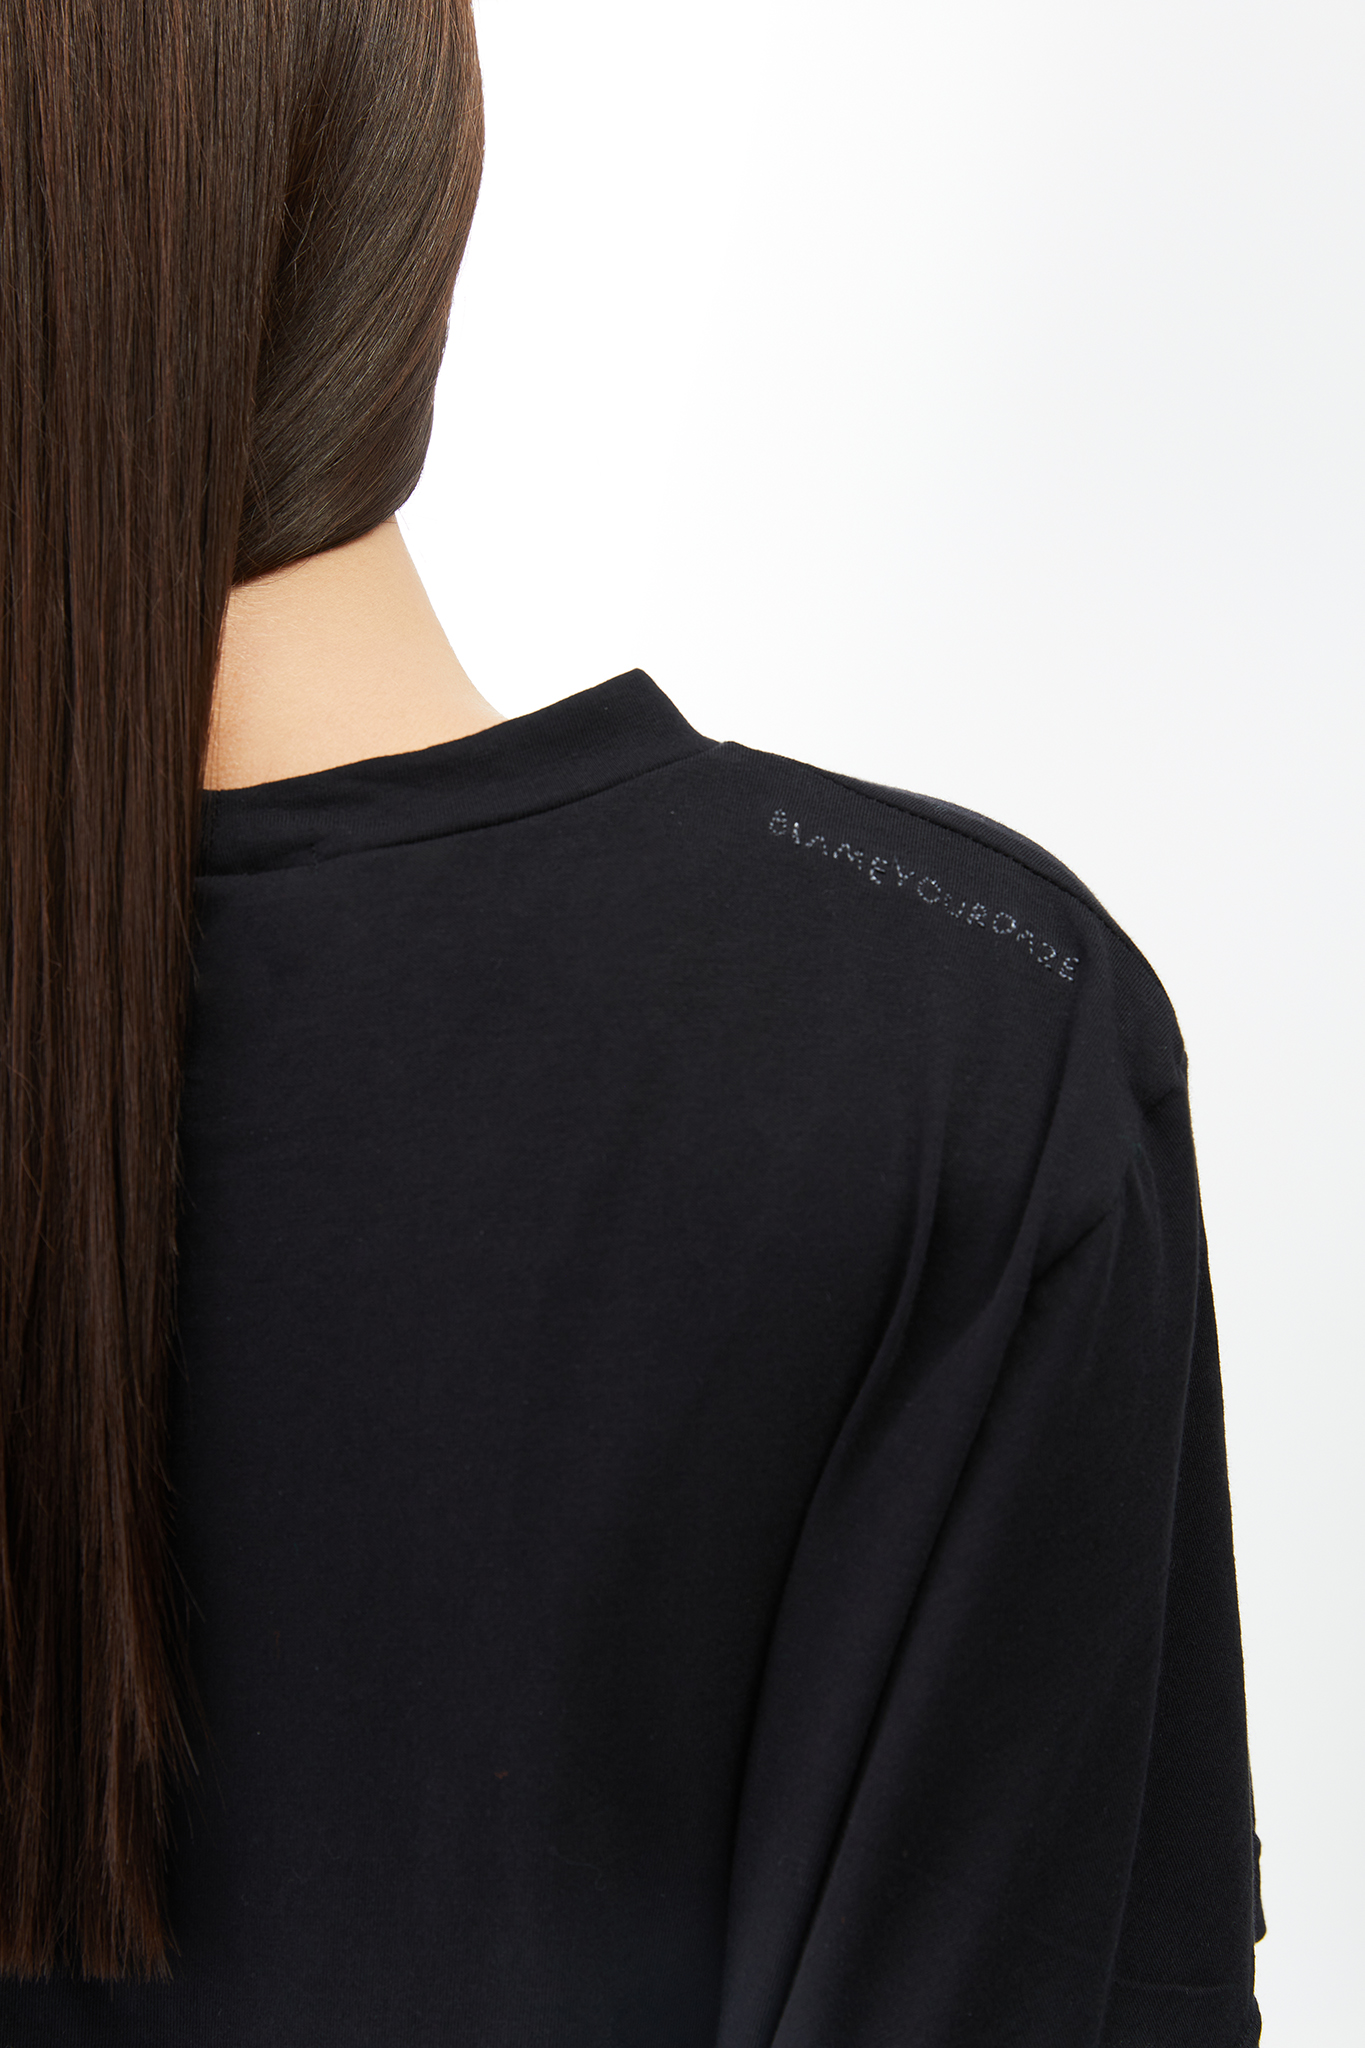 BLAMEYOURDAZE BLACK LOGO MINI DRESS